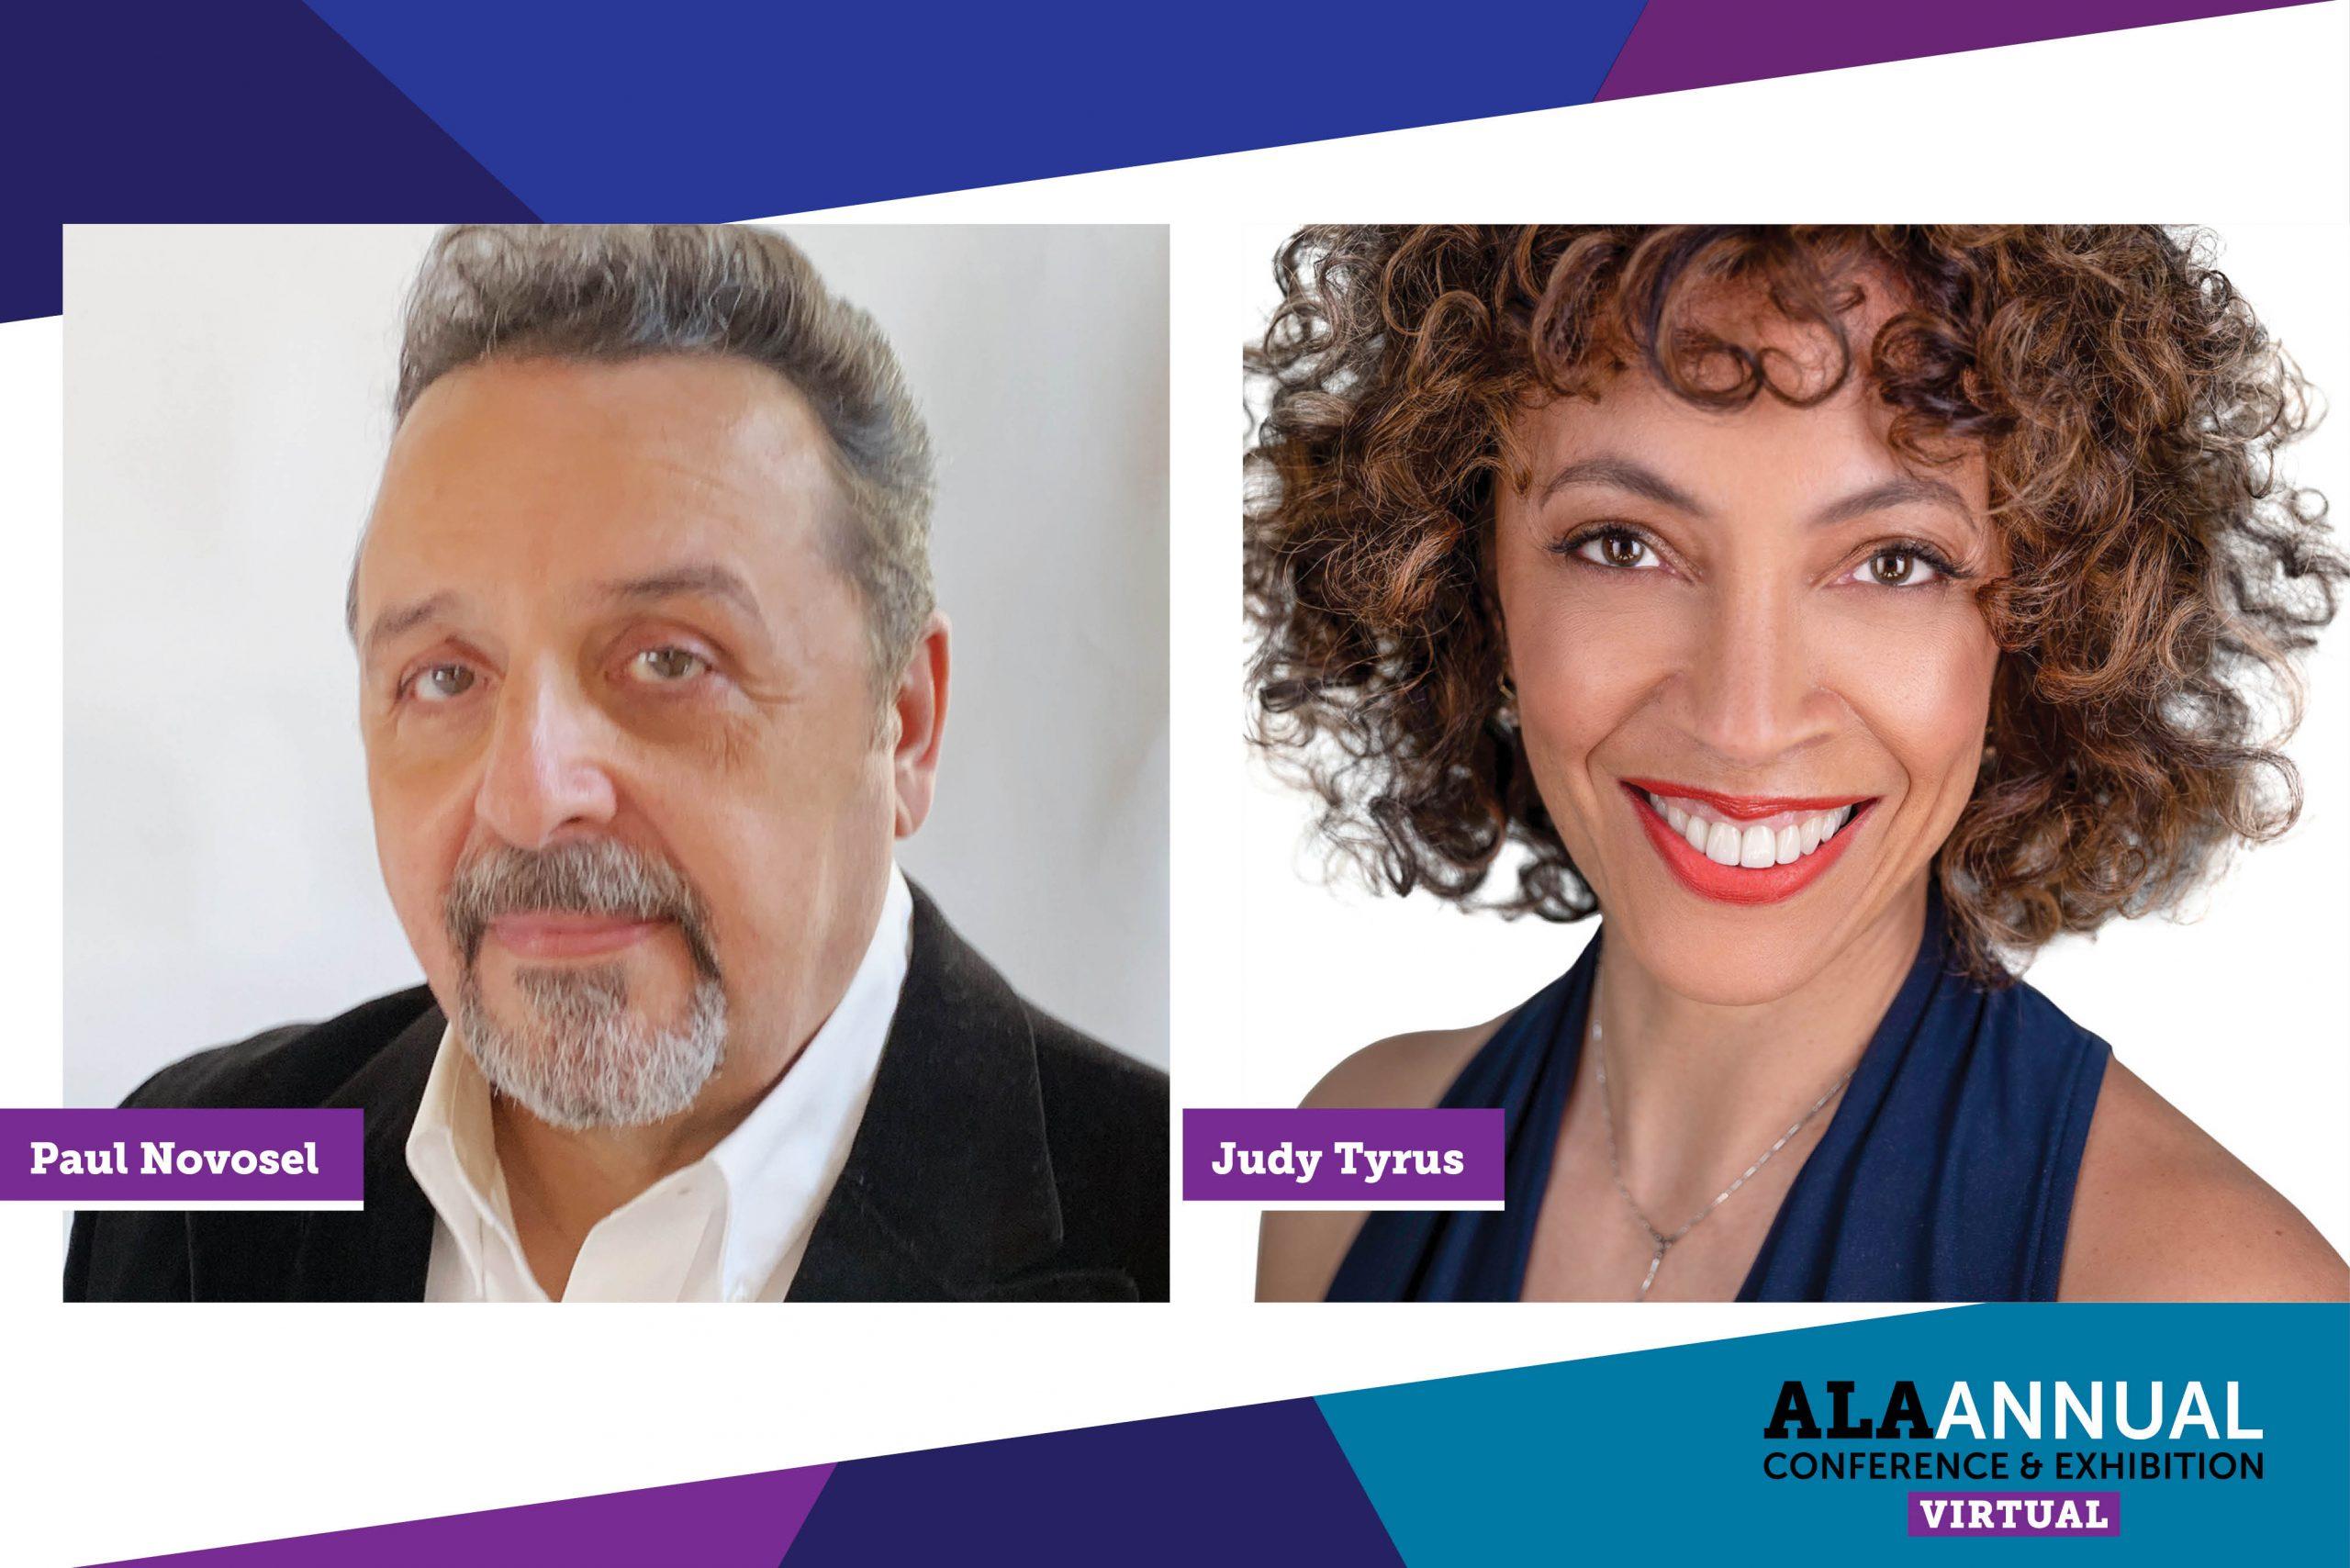 Judy Tyrus and Paul Novosel